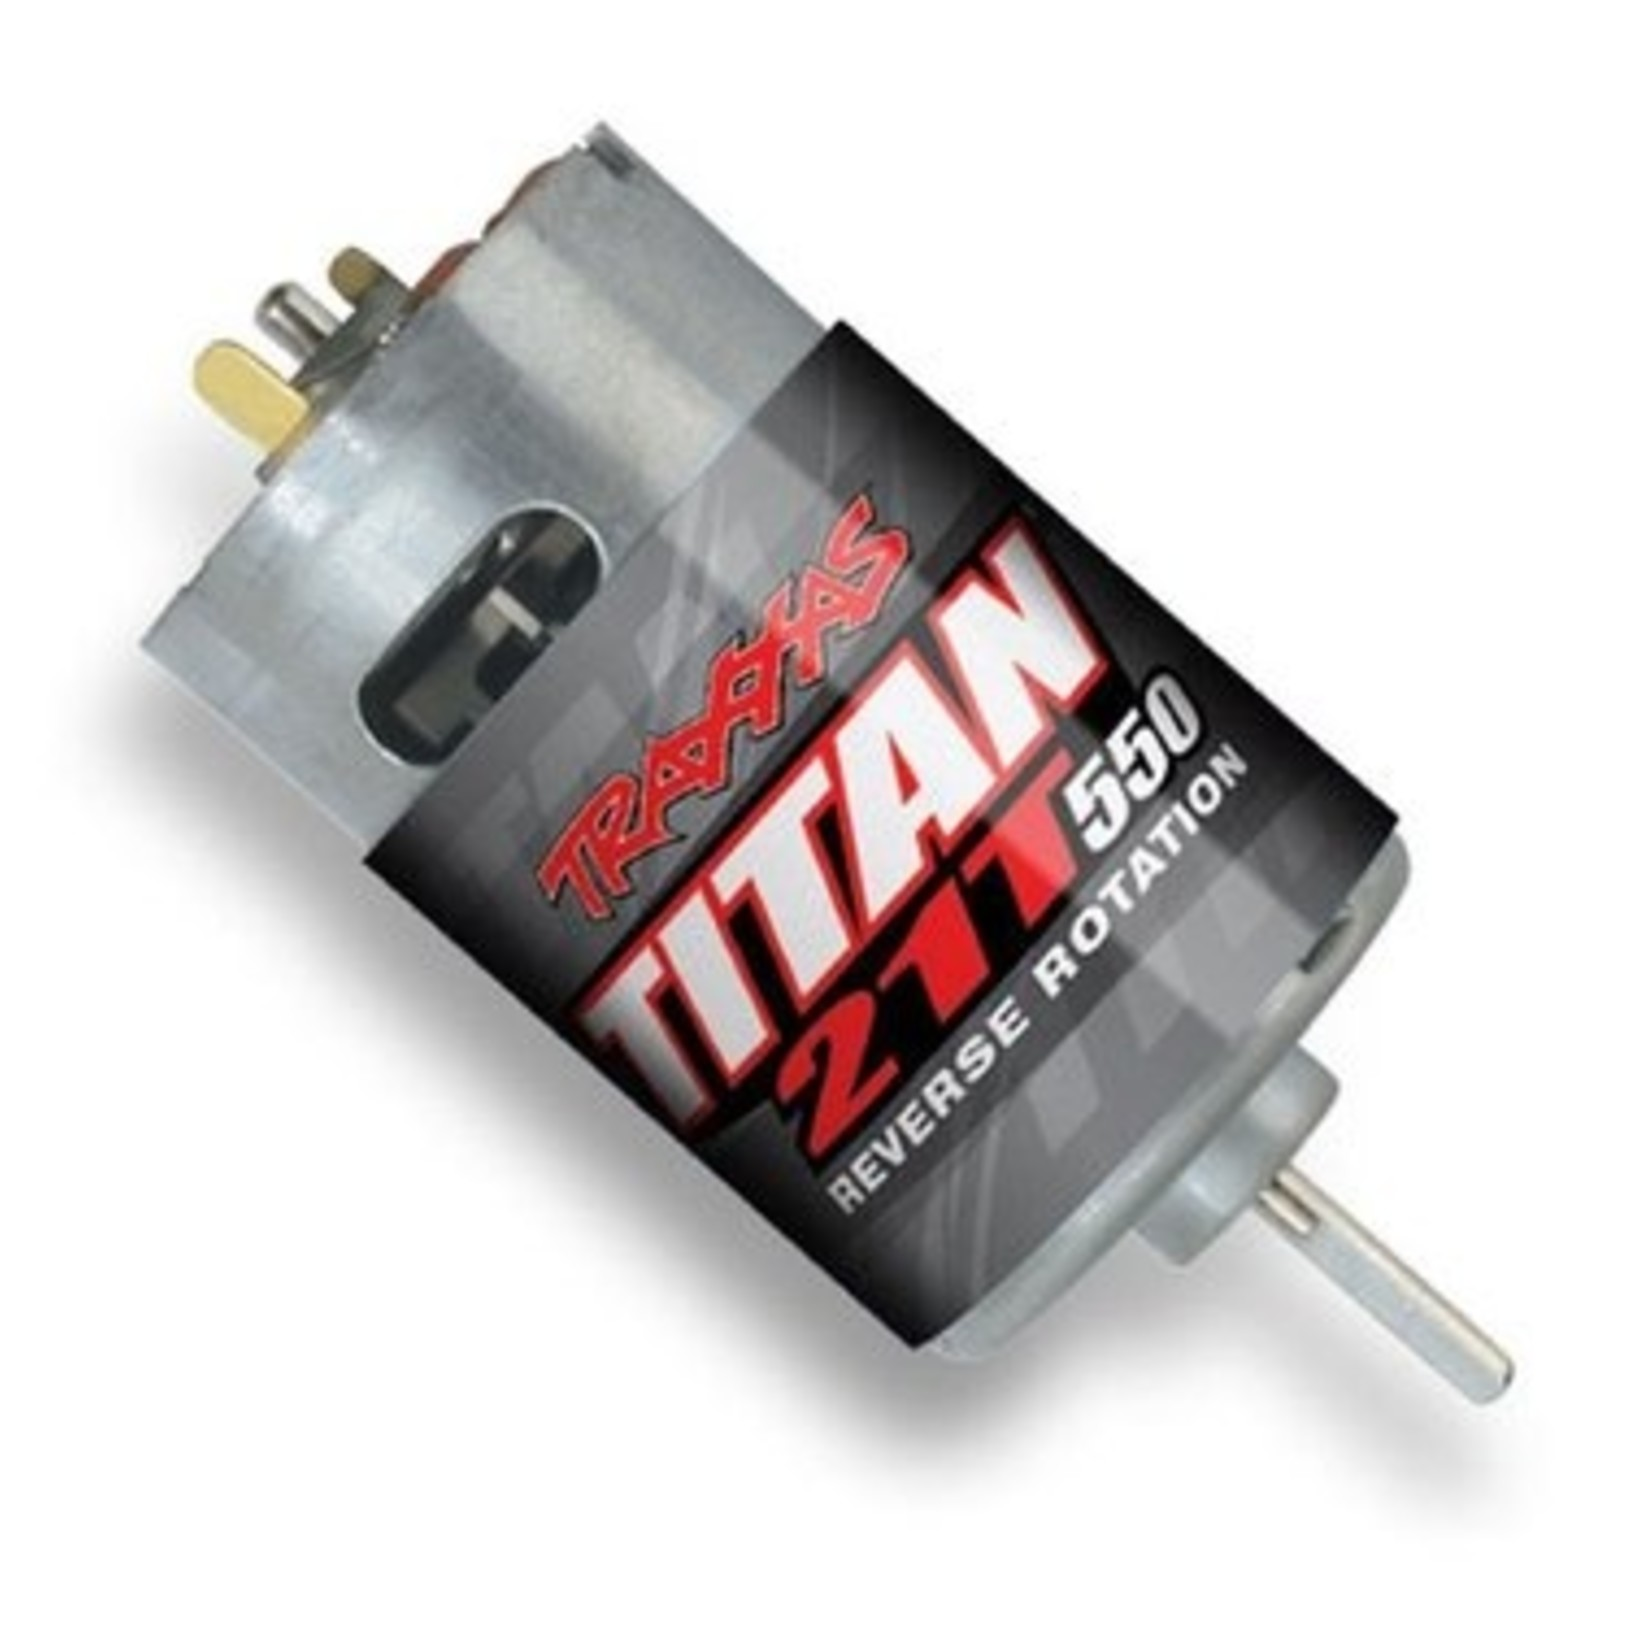 Traxxas TRA3975R Traxxas Motor, Titan 550, Reverse Rotation (21-Turns/ 14 Volts) (1)